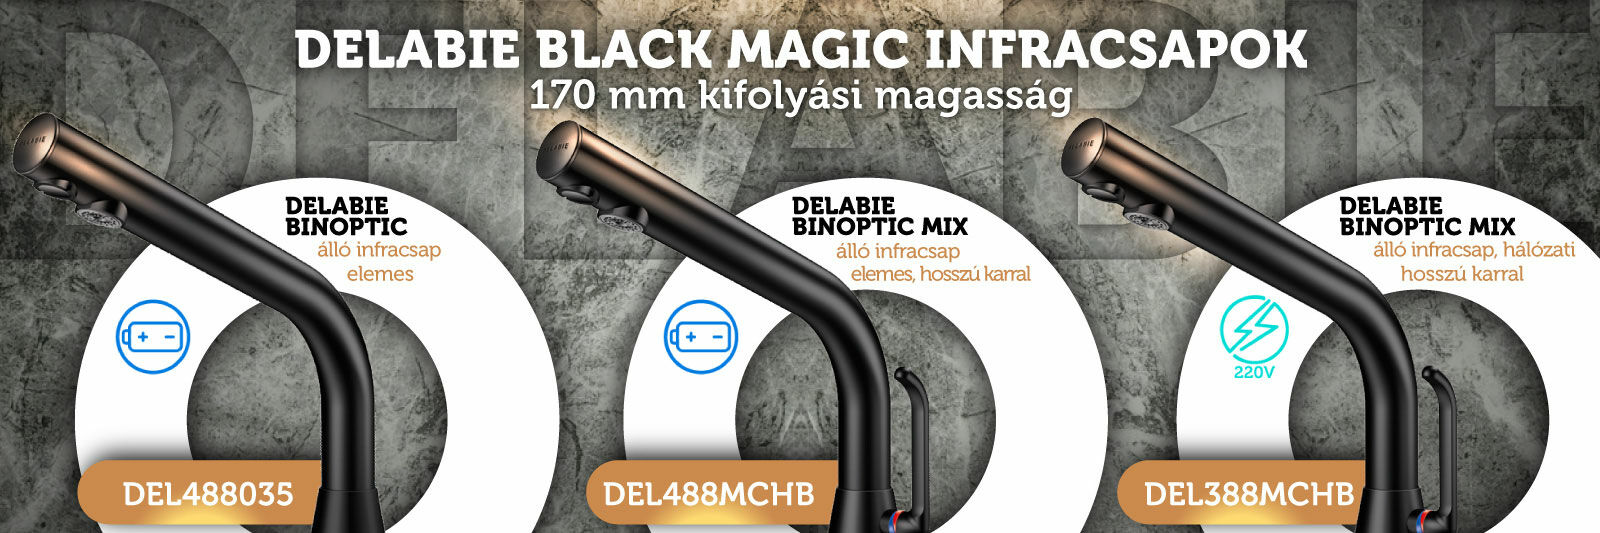 DELABIE Black Magic infracsapok